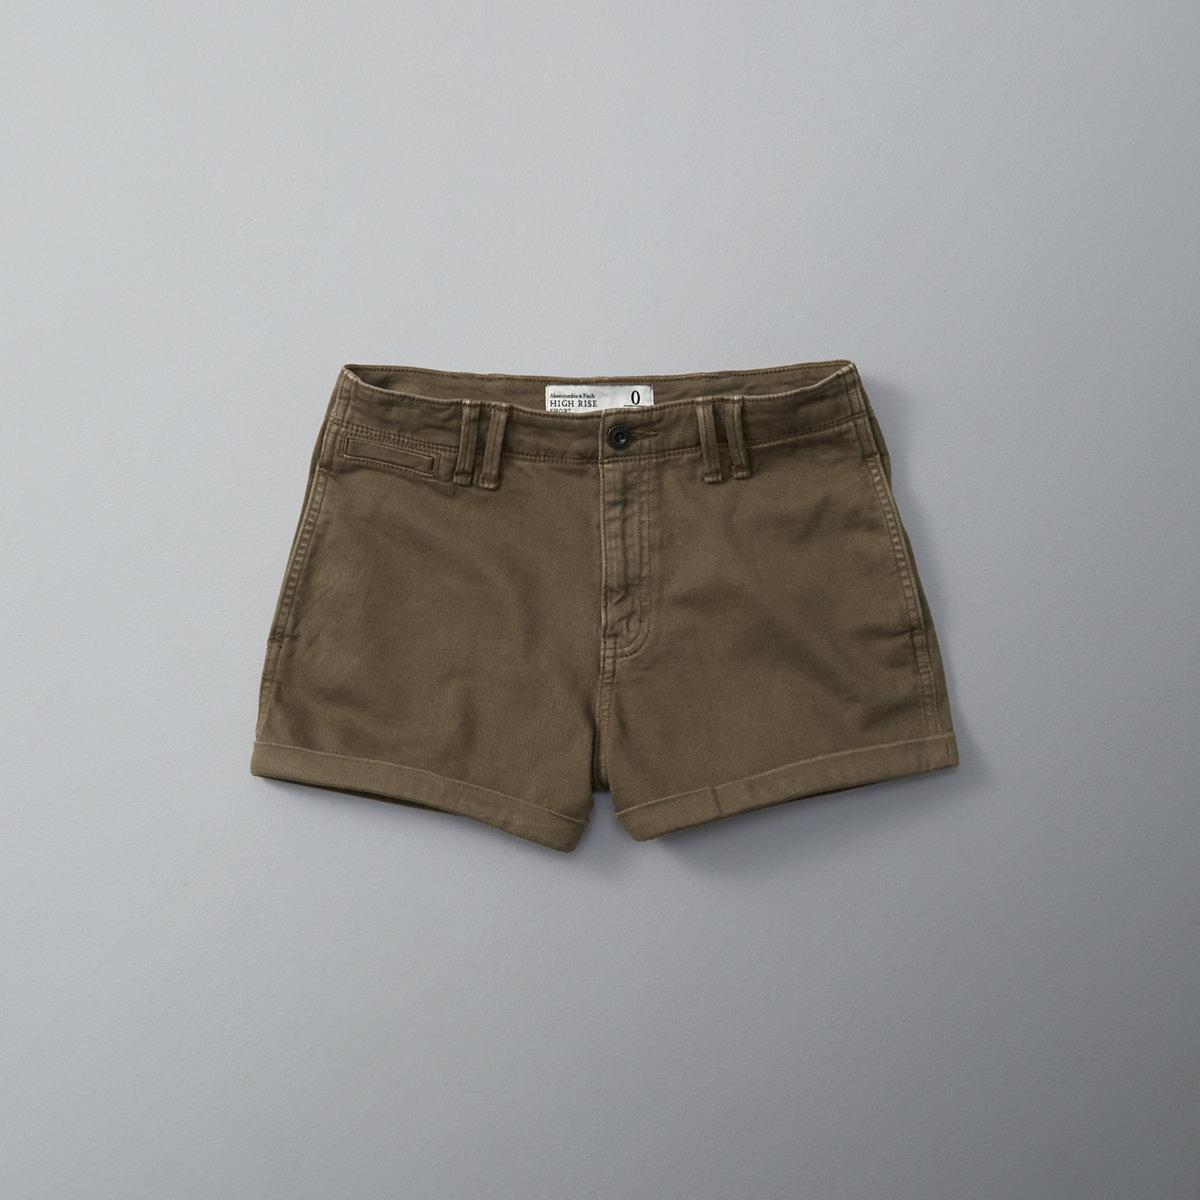 High Rise 2 Inch Chino Shorts